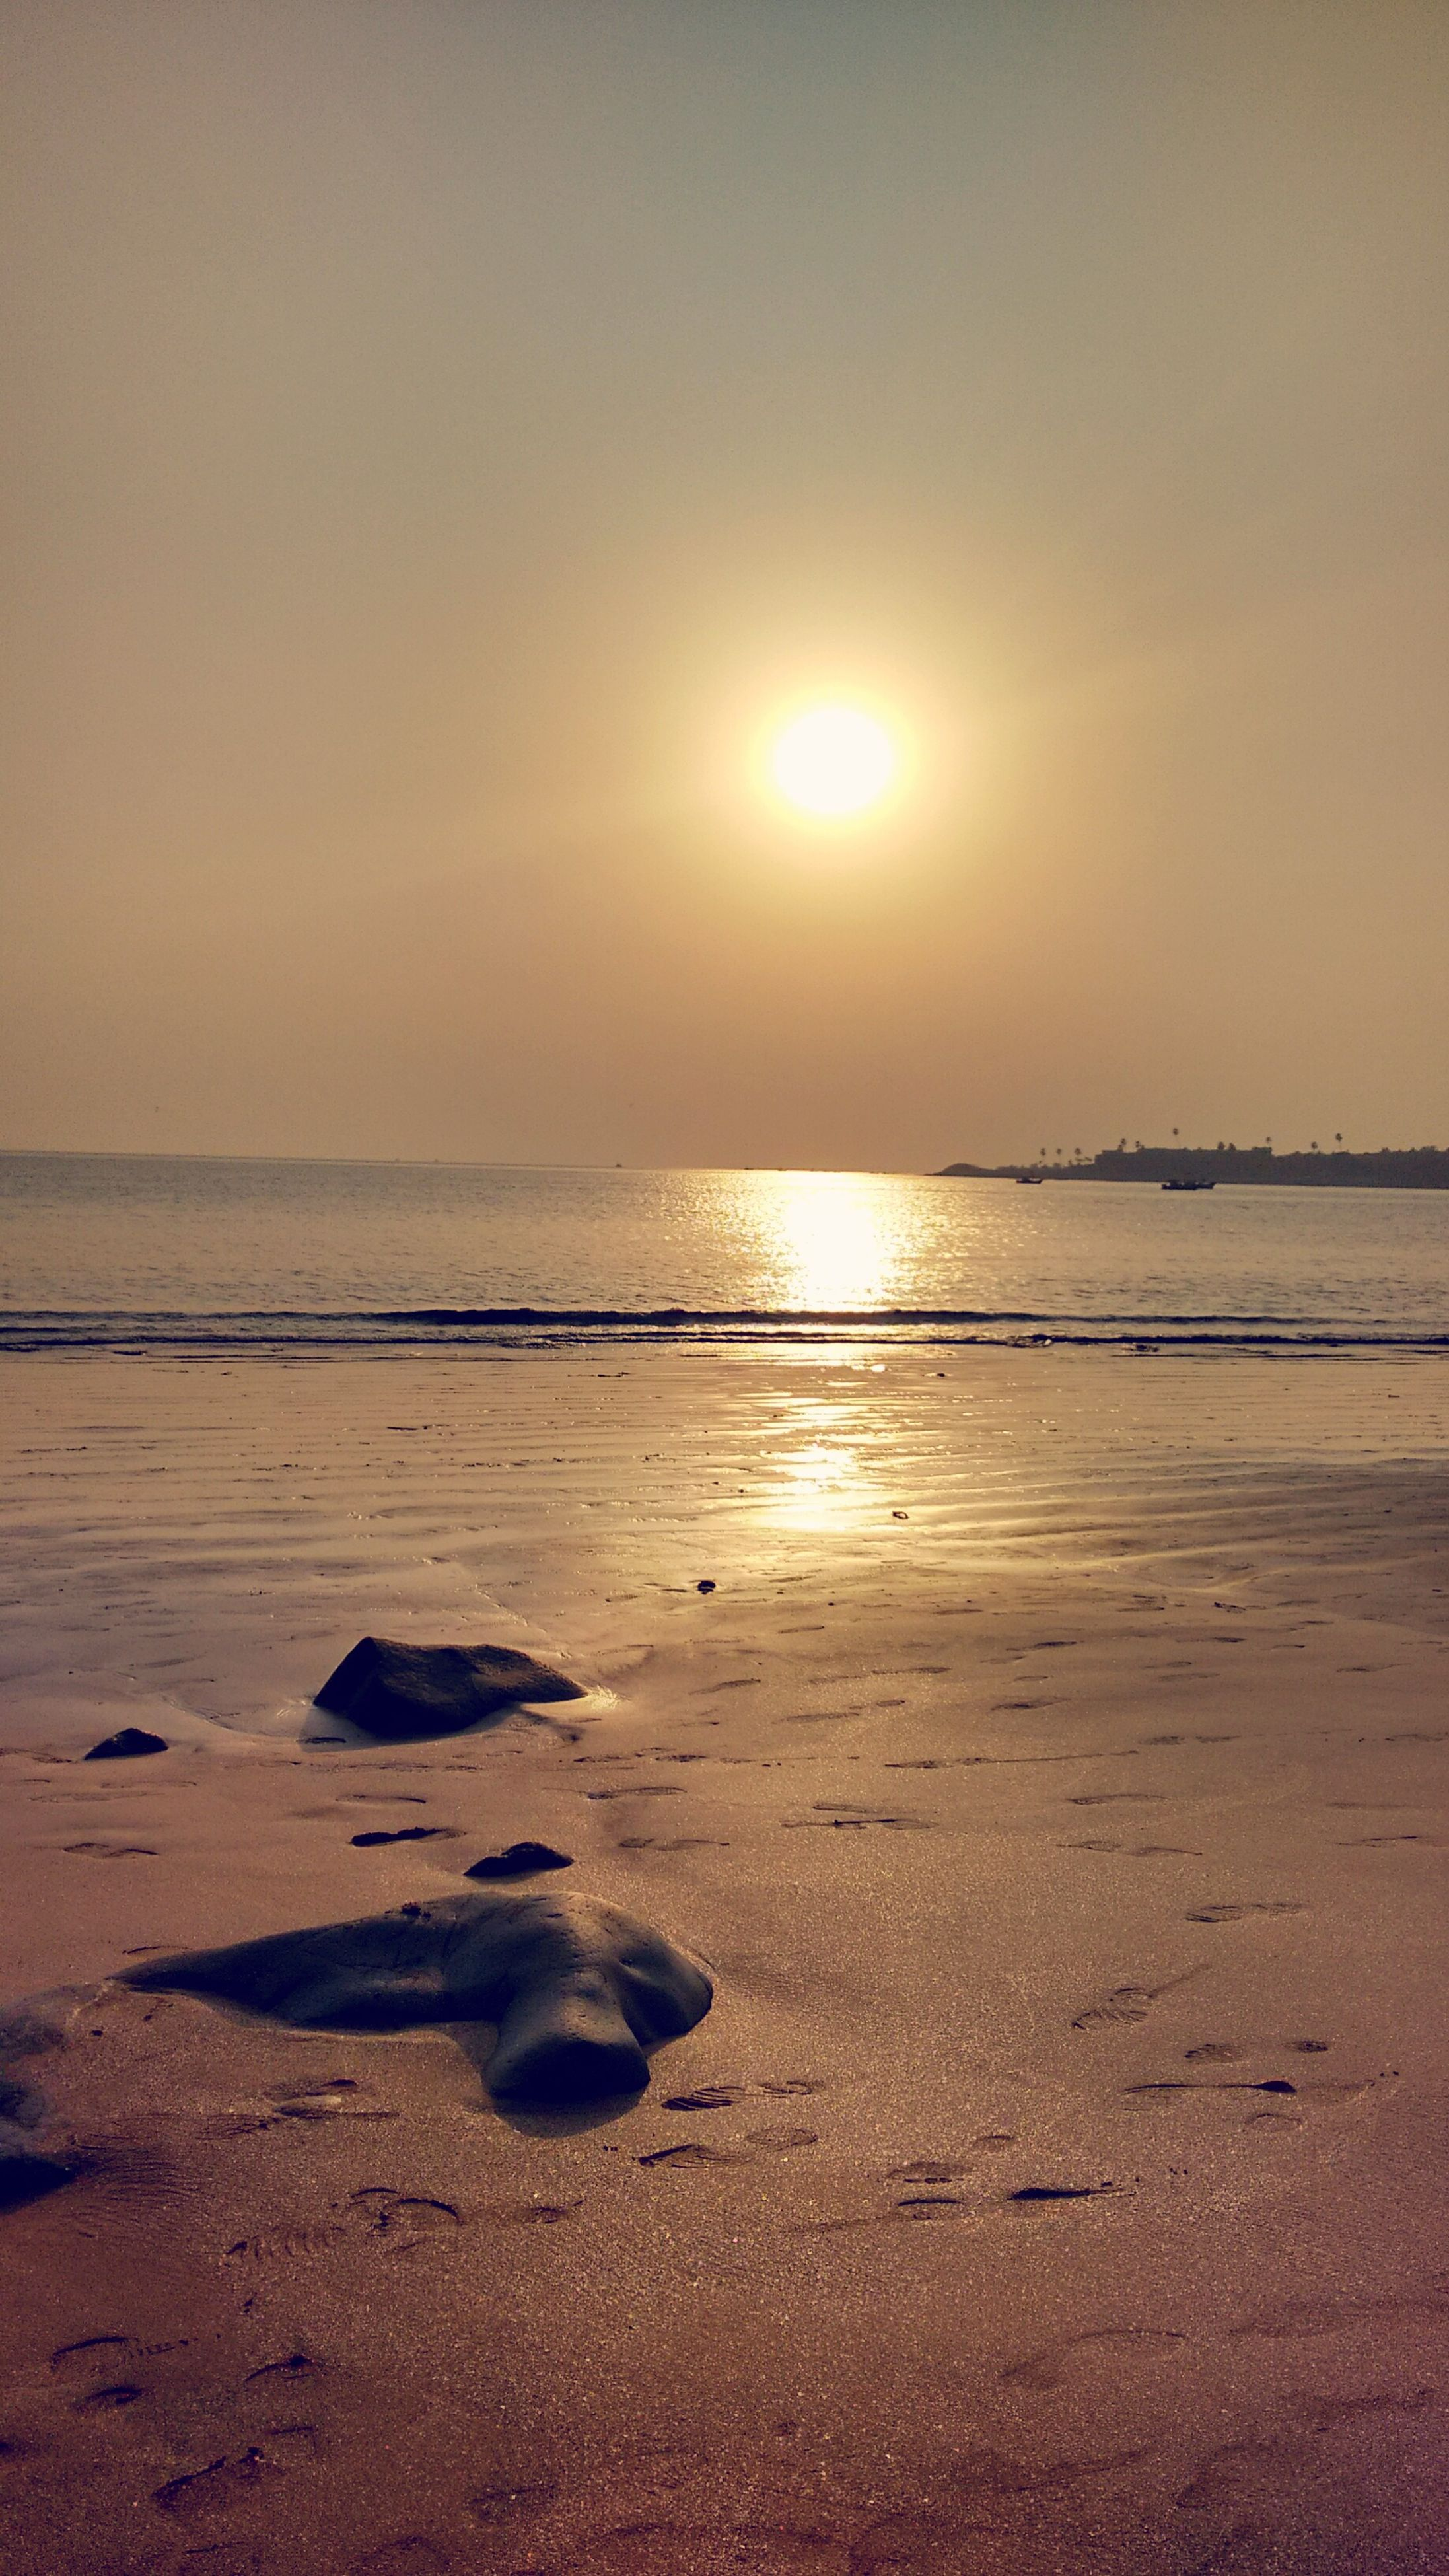 beach, sea, water, shore, sunset, horizon over water, sun, tranquil scene, scenics, tranquility, sand, beauty in nature, sky, reflection, nature, sunlight, idyllic, coastline, wave, calm